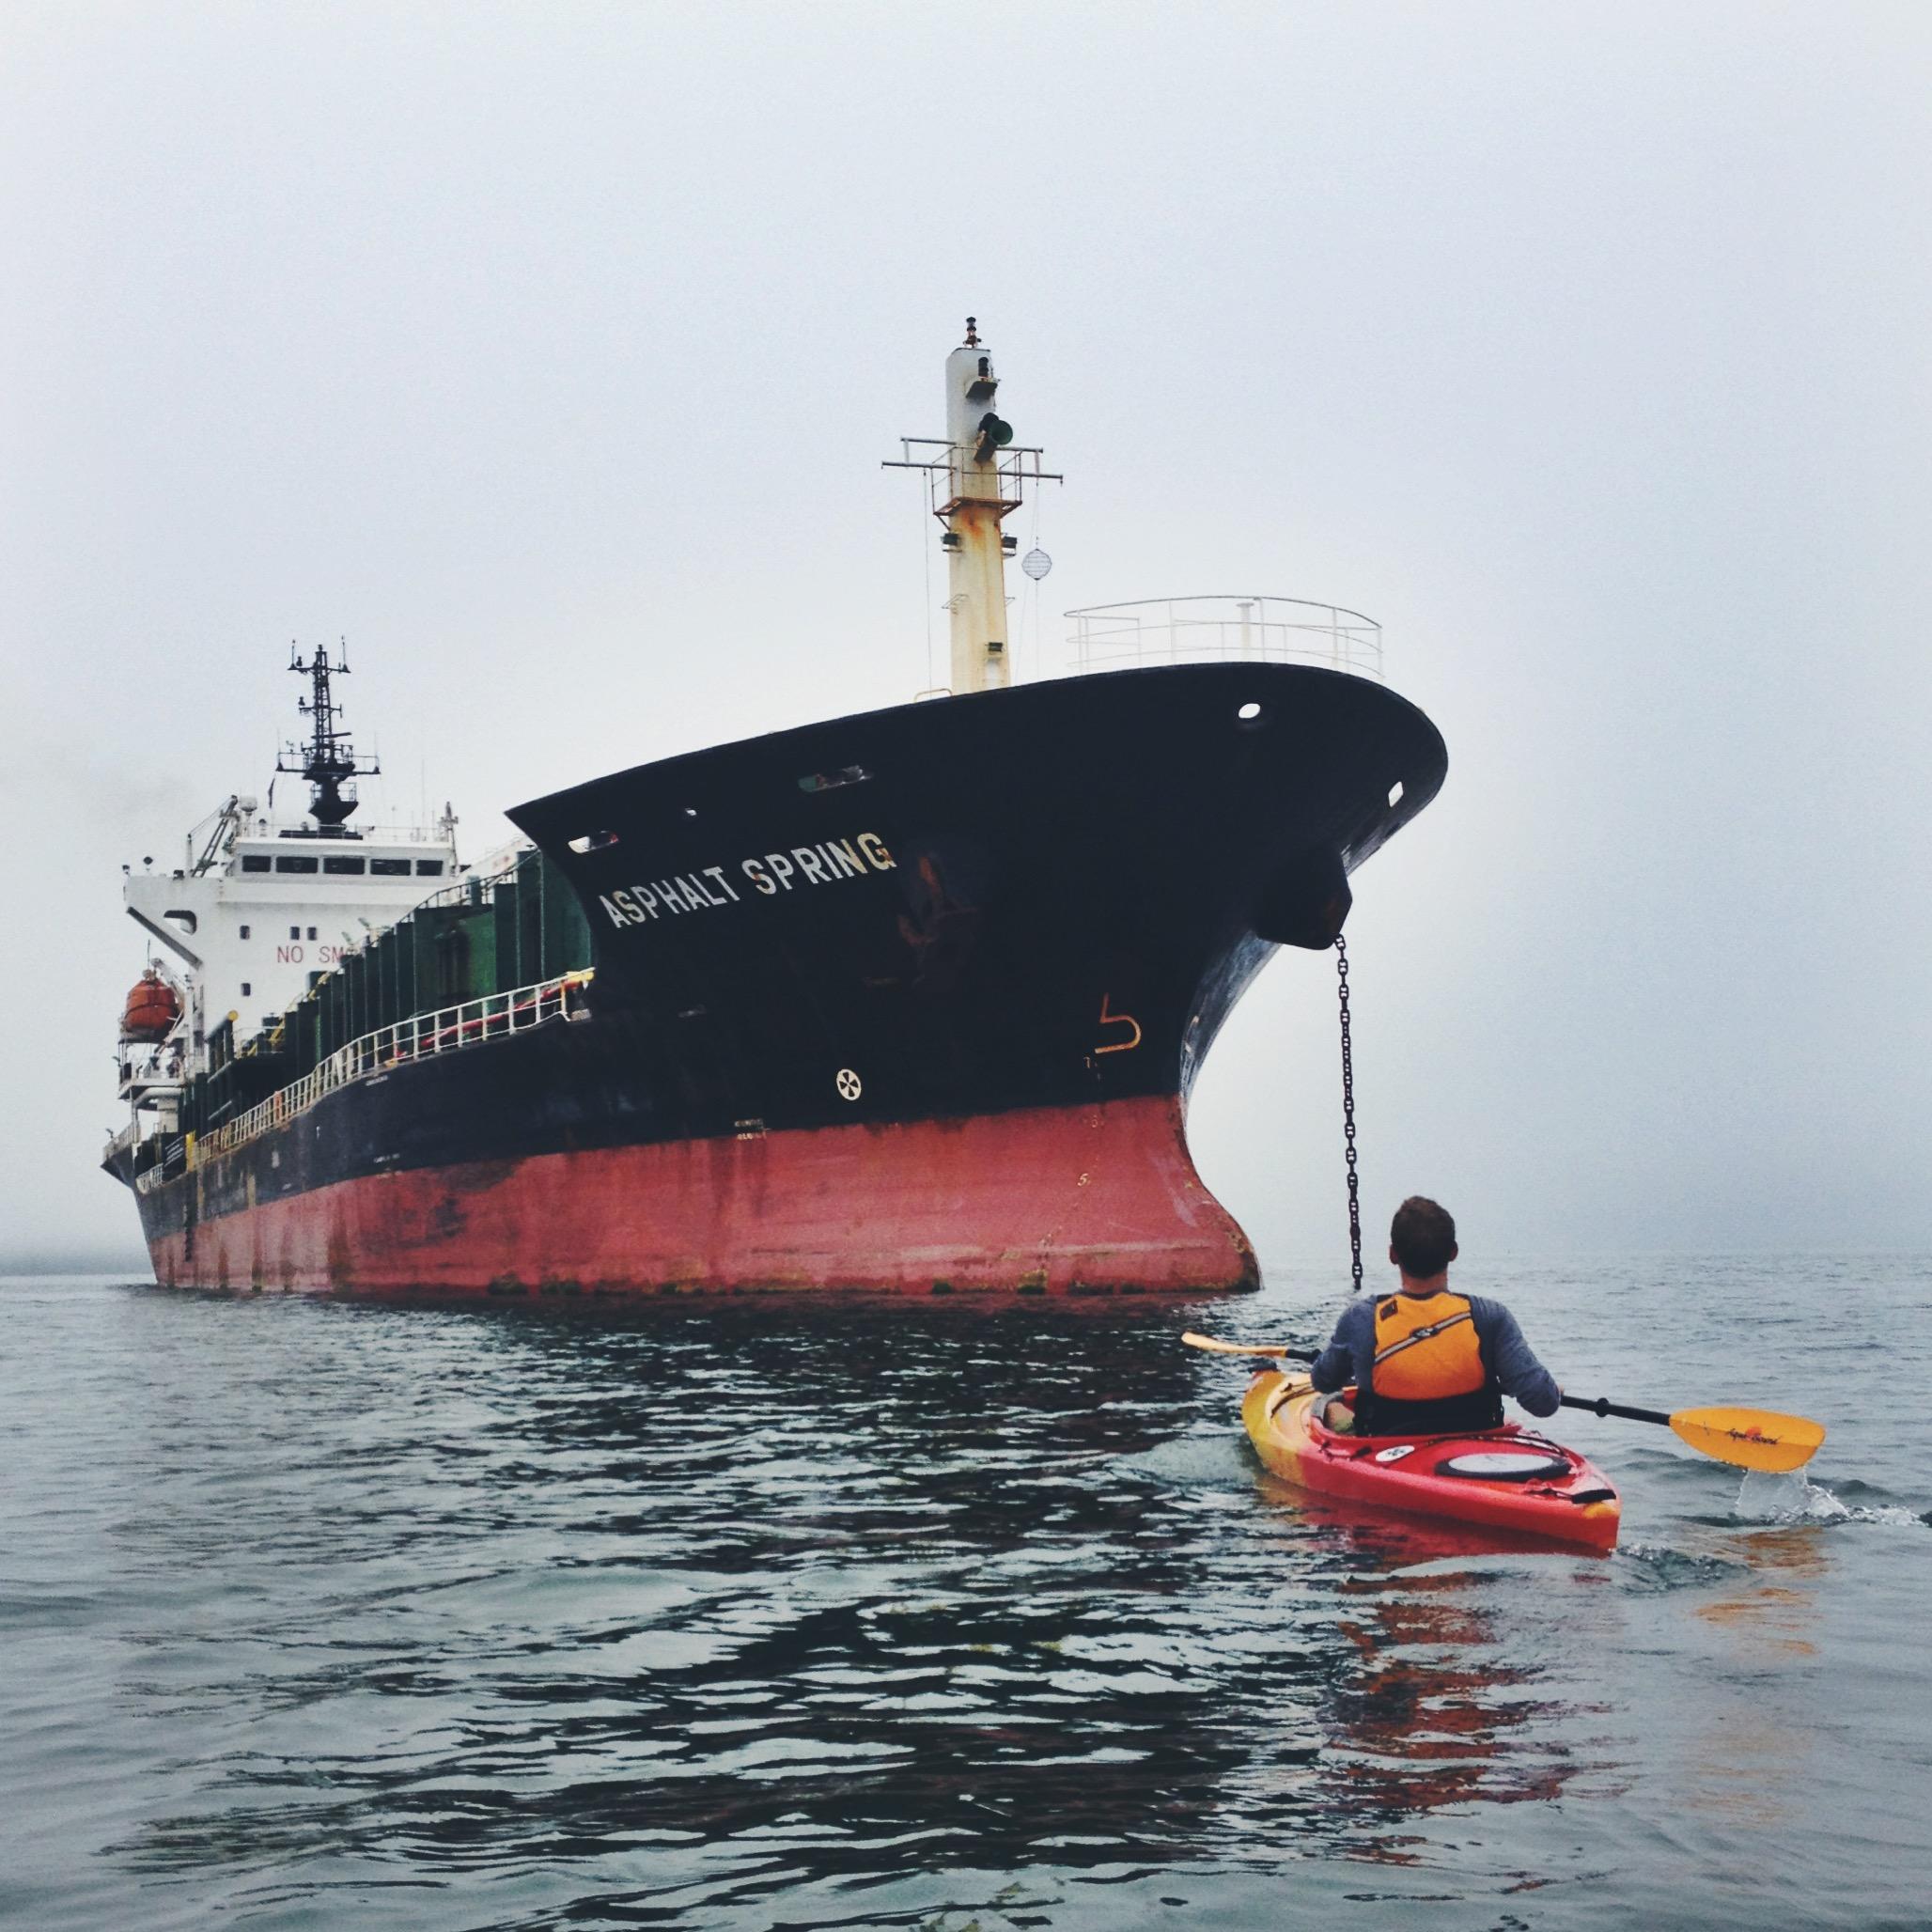 Teton and the tanker.